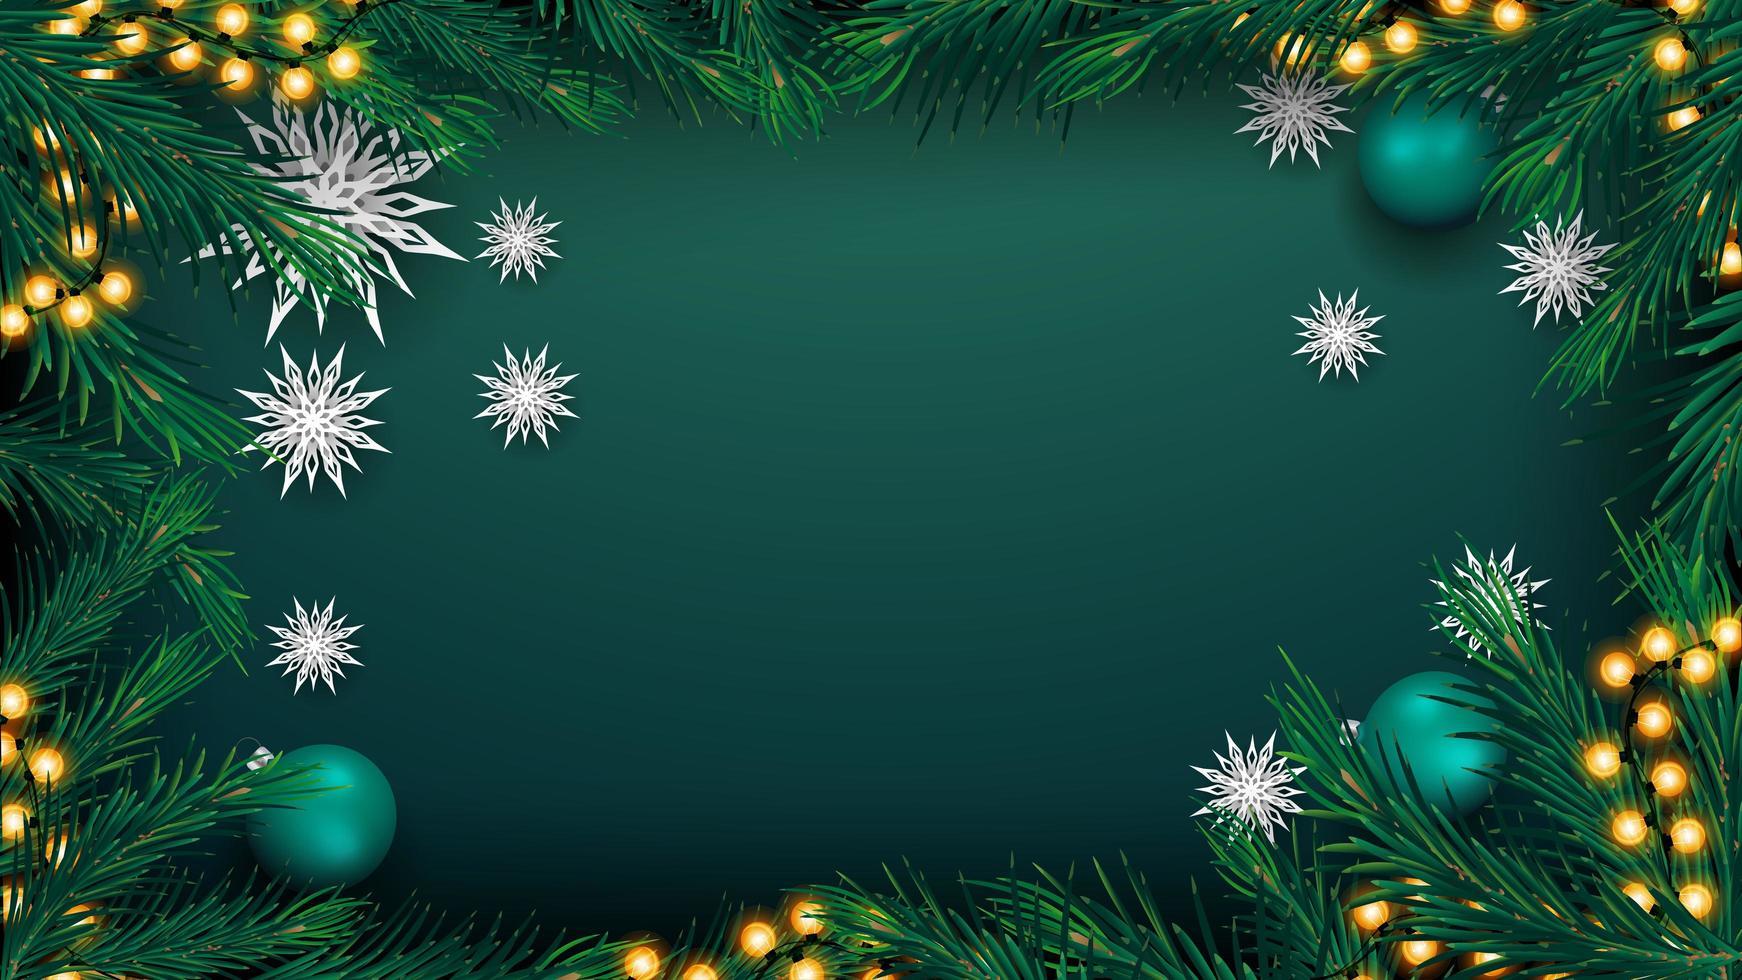 Kerstmis groene achtergrond met slinger en boomtakken vector